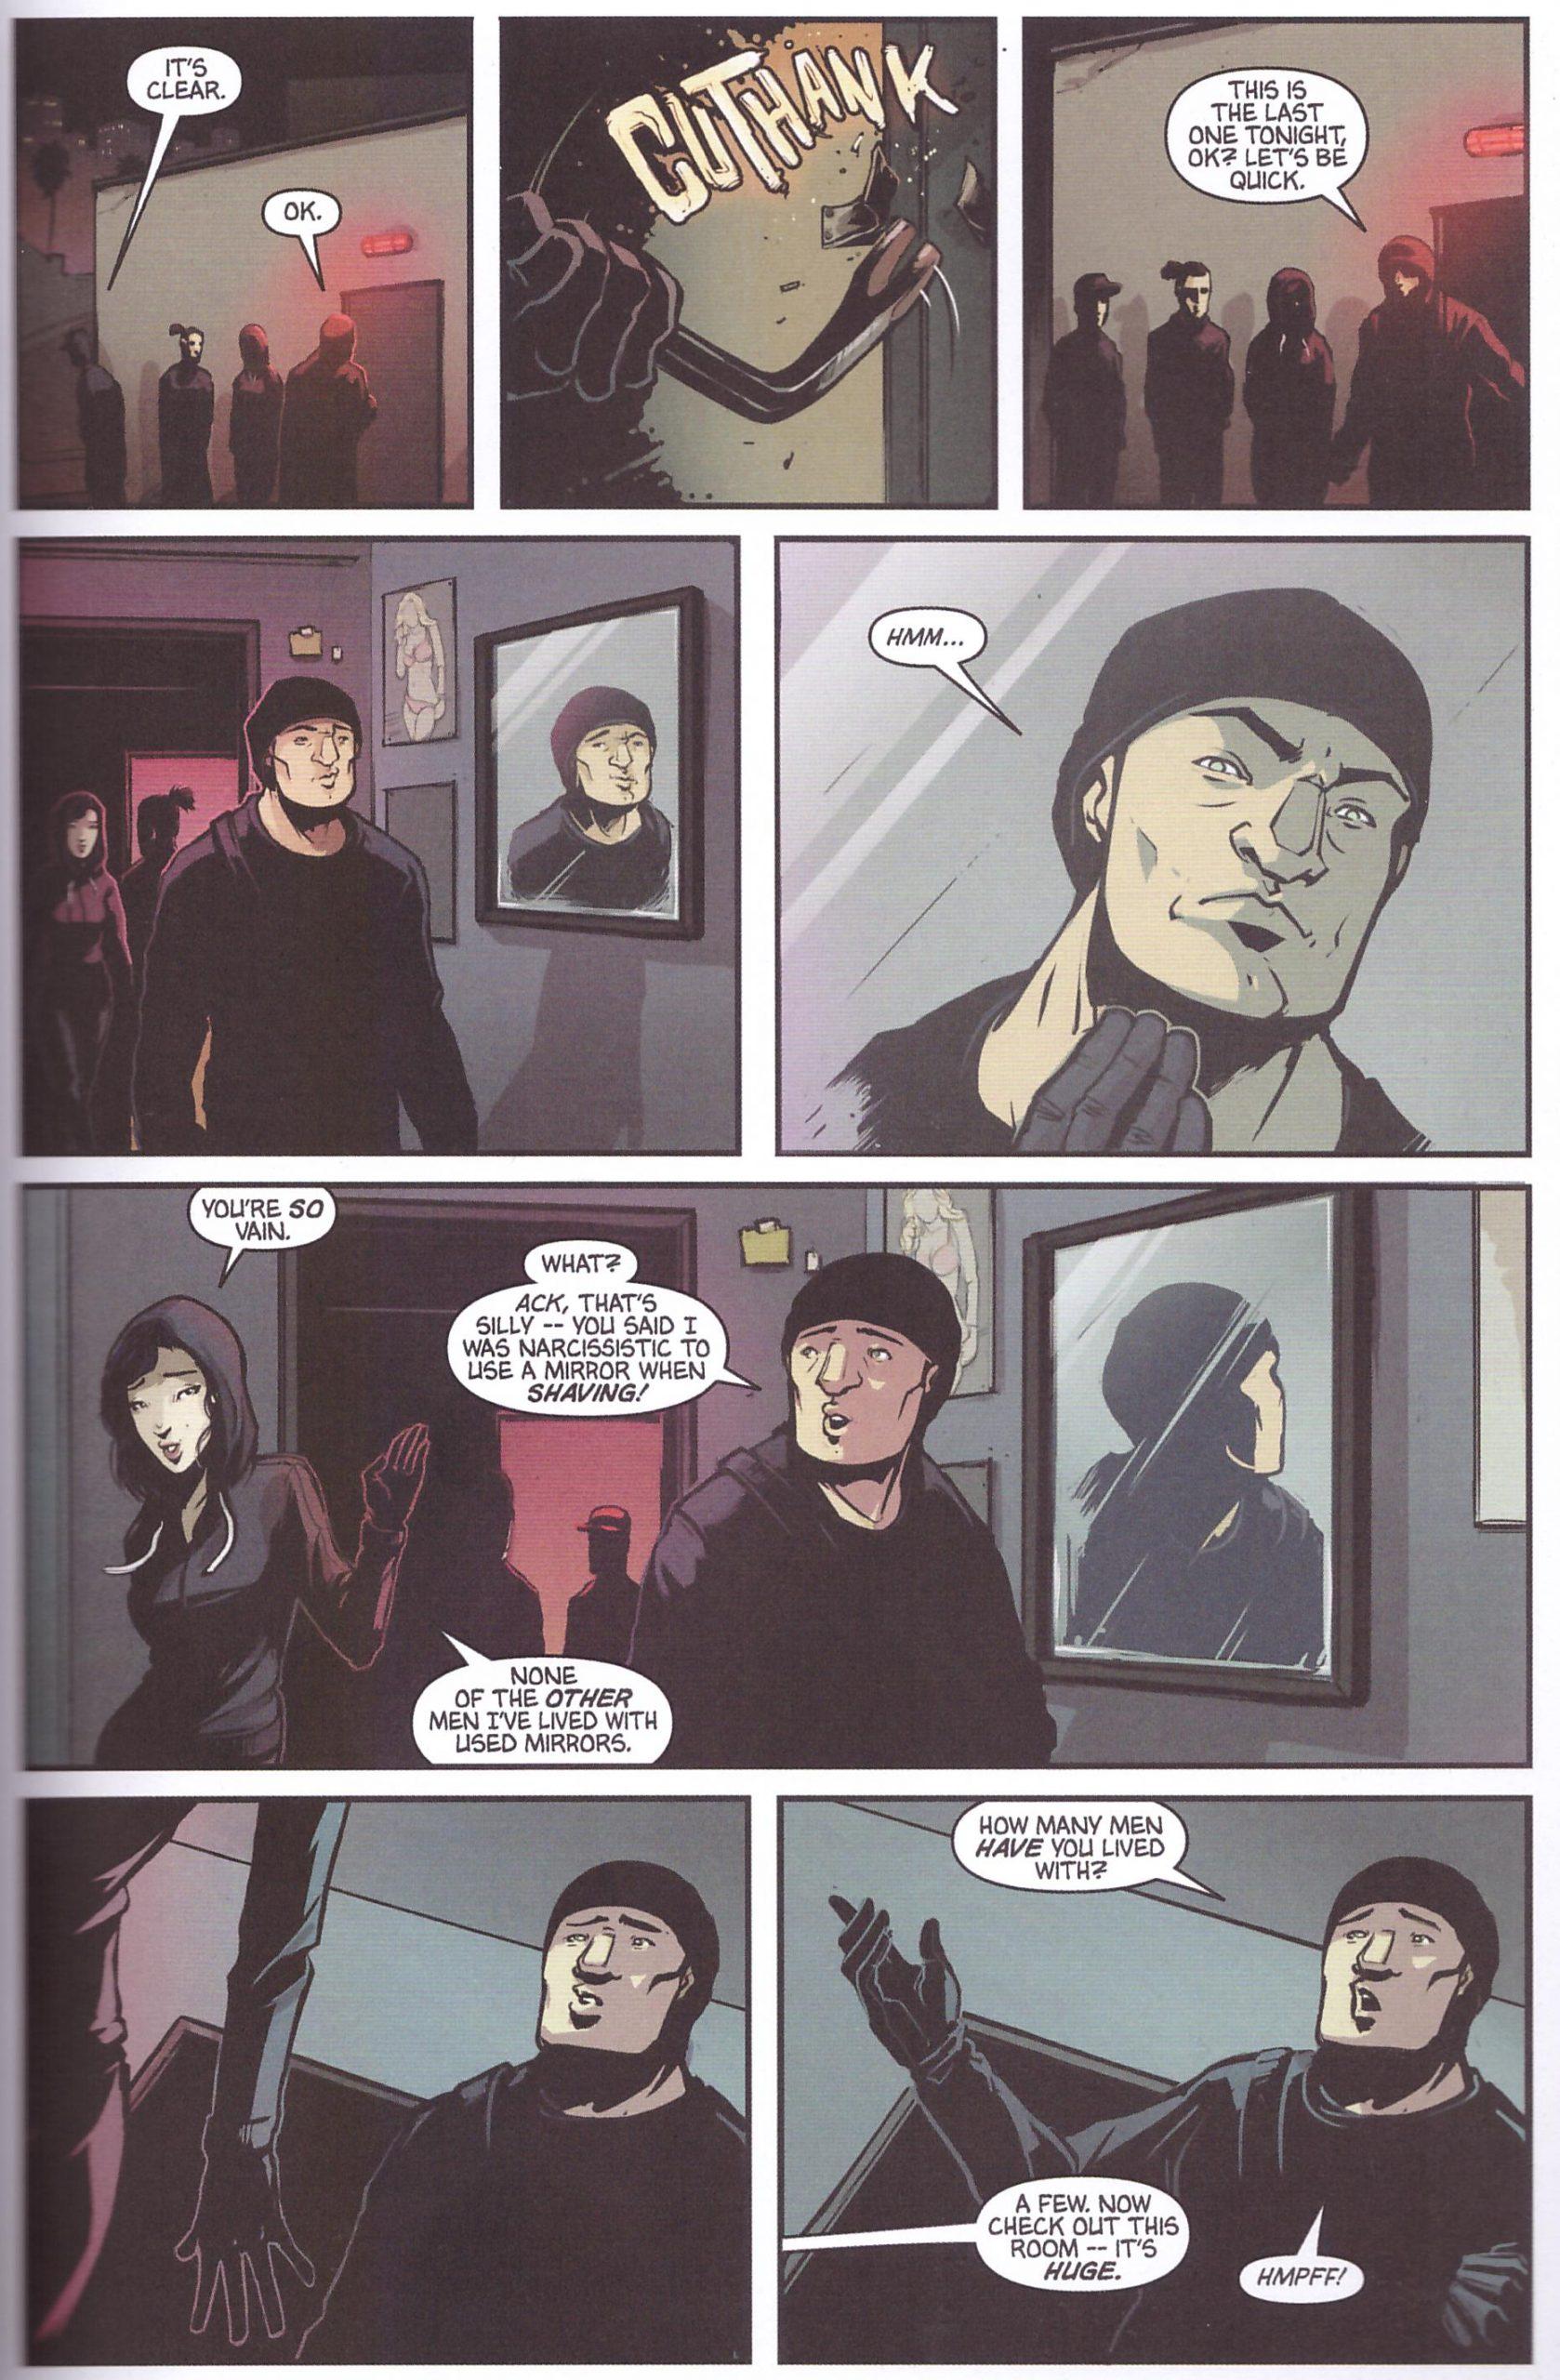 Tabatha graphic novel review